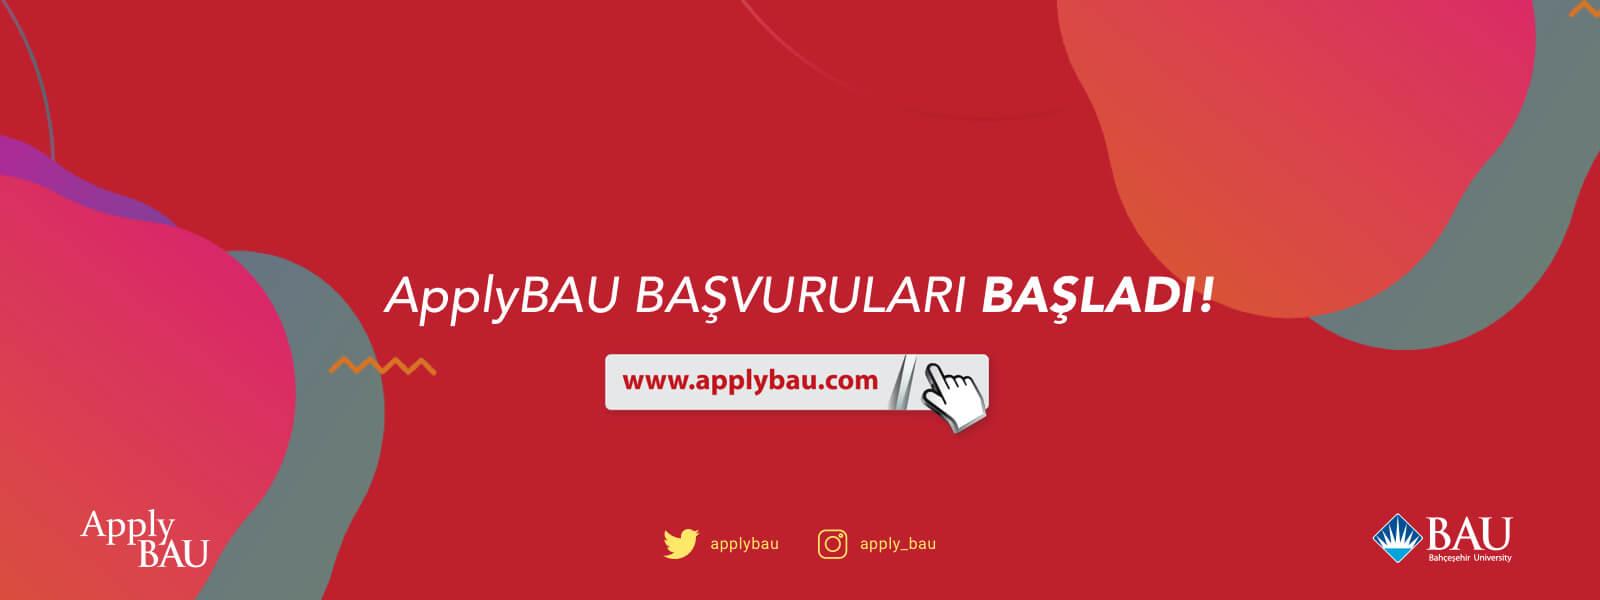 http://content.bahcesehir.edu.tr/applybau, burs, universite, başvuru